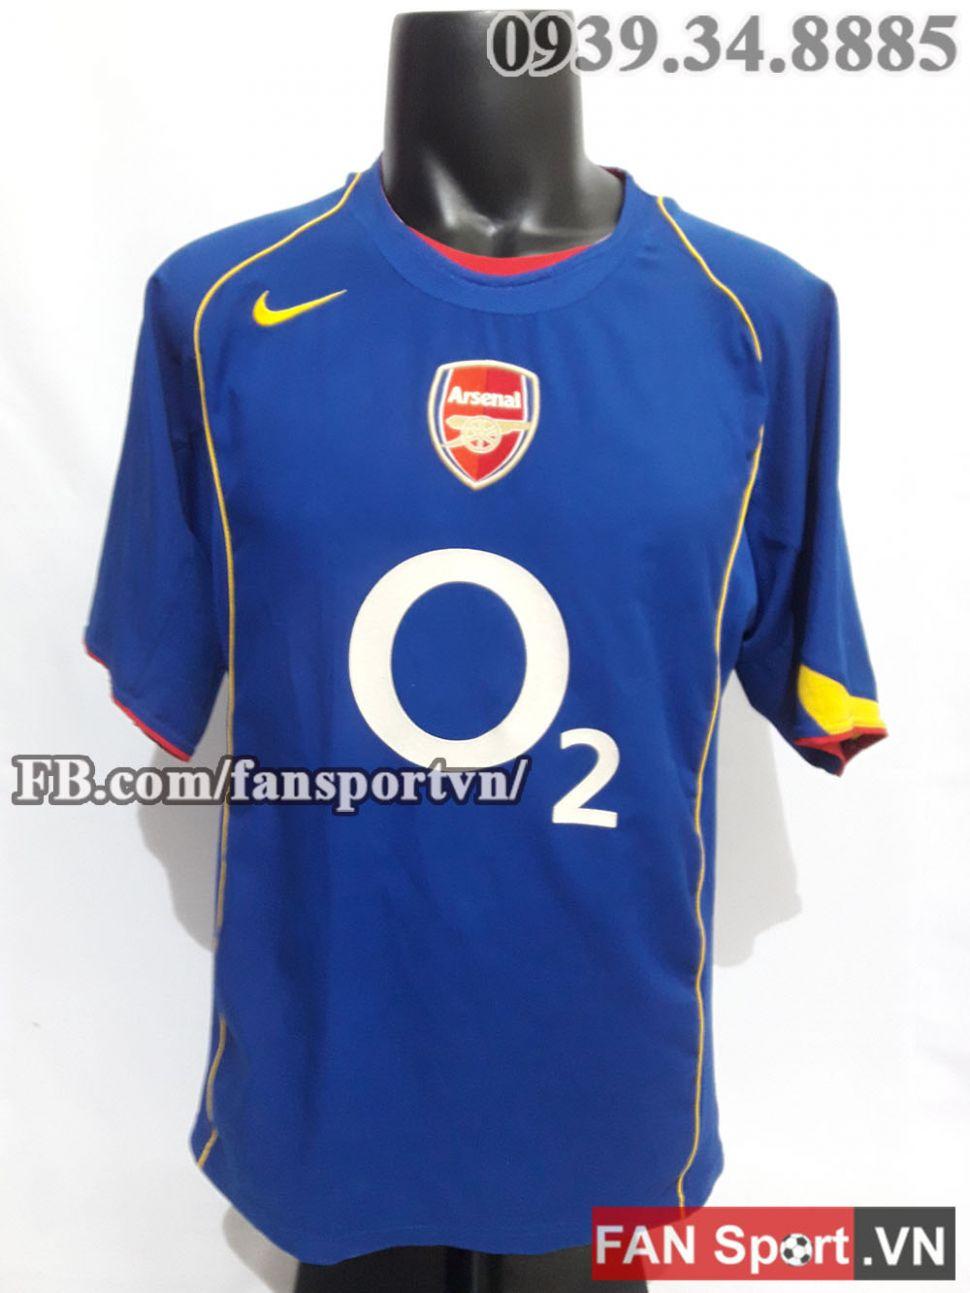 6b3c10a4e Áo đấu Arsenal 2004-2005 away shirt jersey blue size L